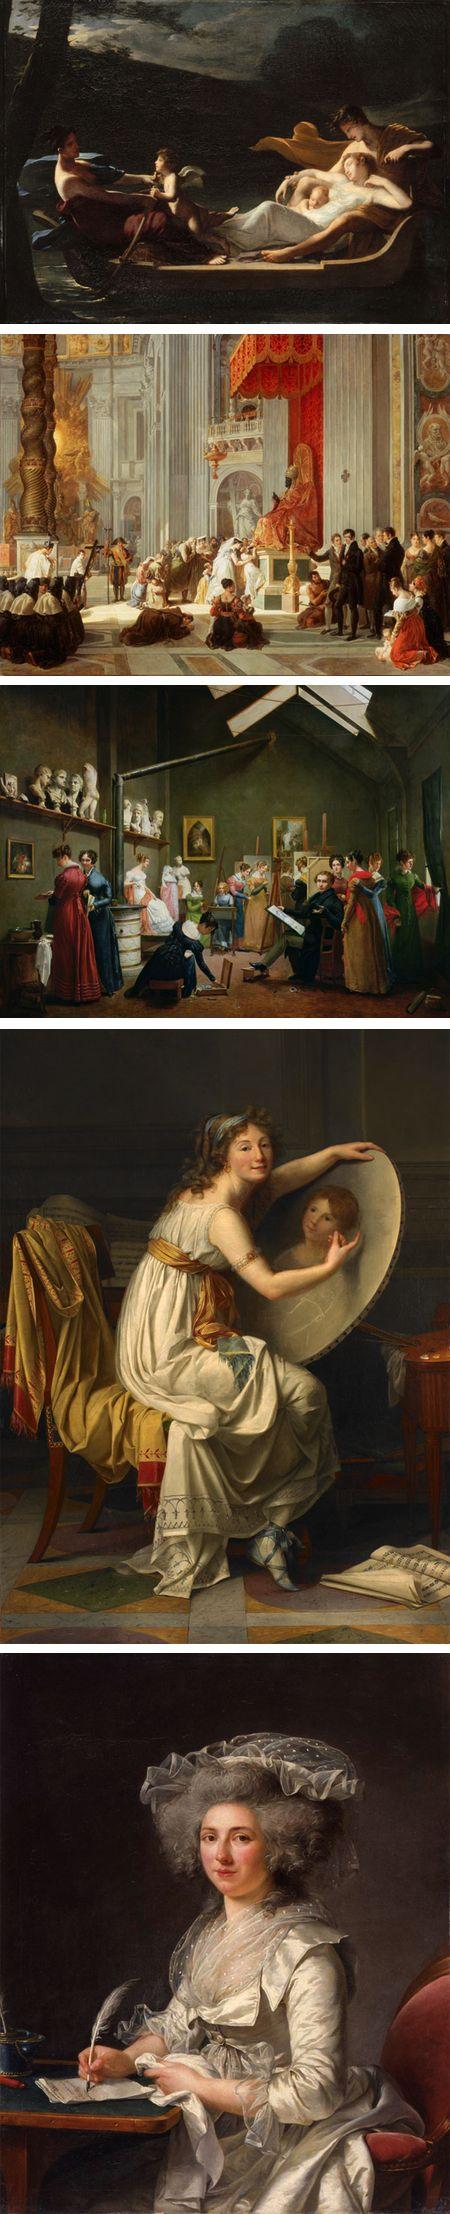 Painting as Paris Burned: Constance Mayer, Antoinette Cecile Hortense, Adrienne Marie Louise Grandpierre-Deverzy, Rose Adelaide Ducreux, Adelaide Labille-Guiard